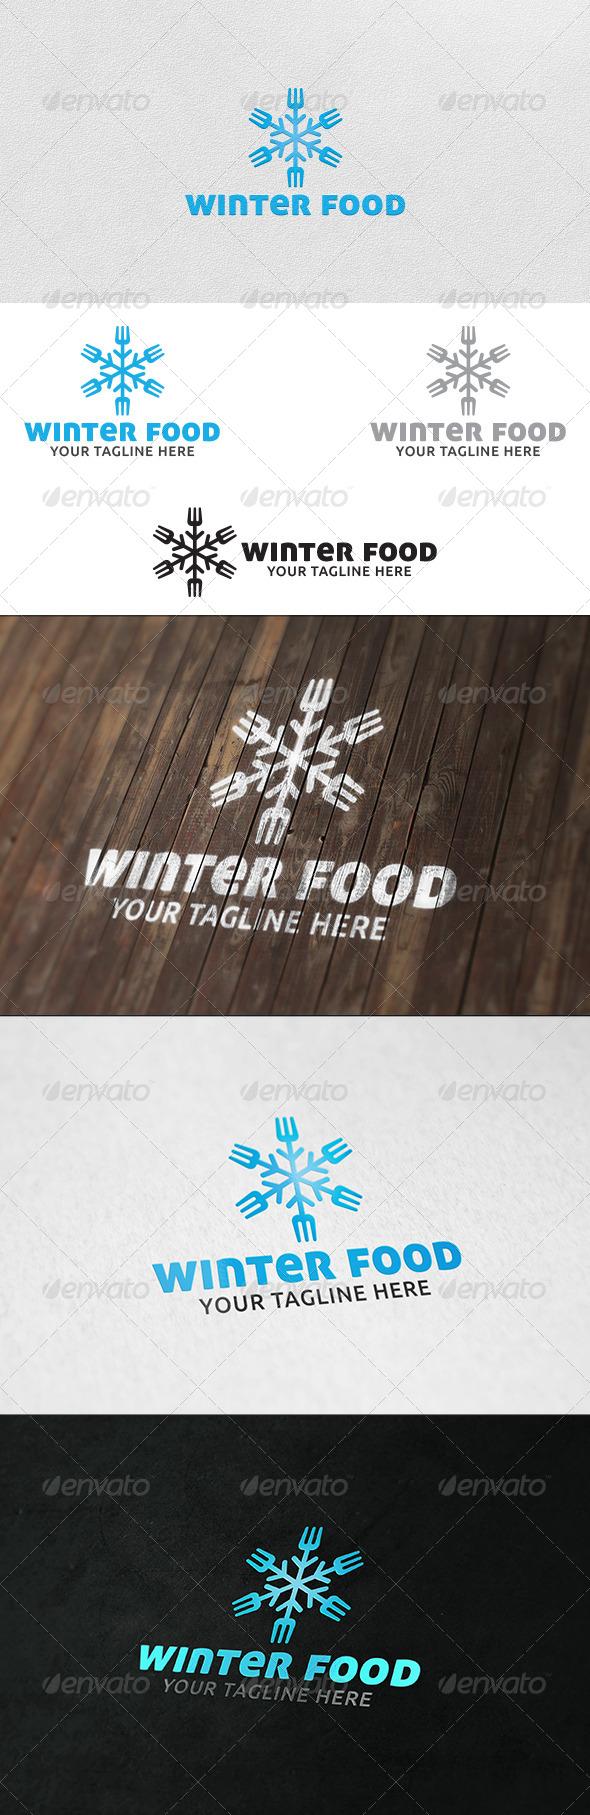 GraphicRiver Winter Food Logo Template 6183360